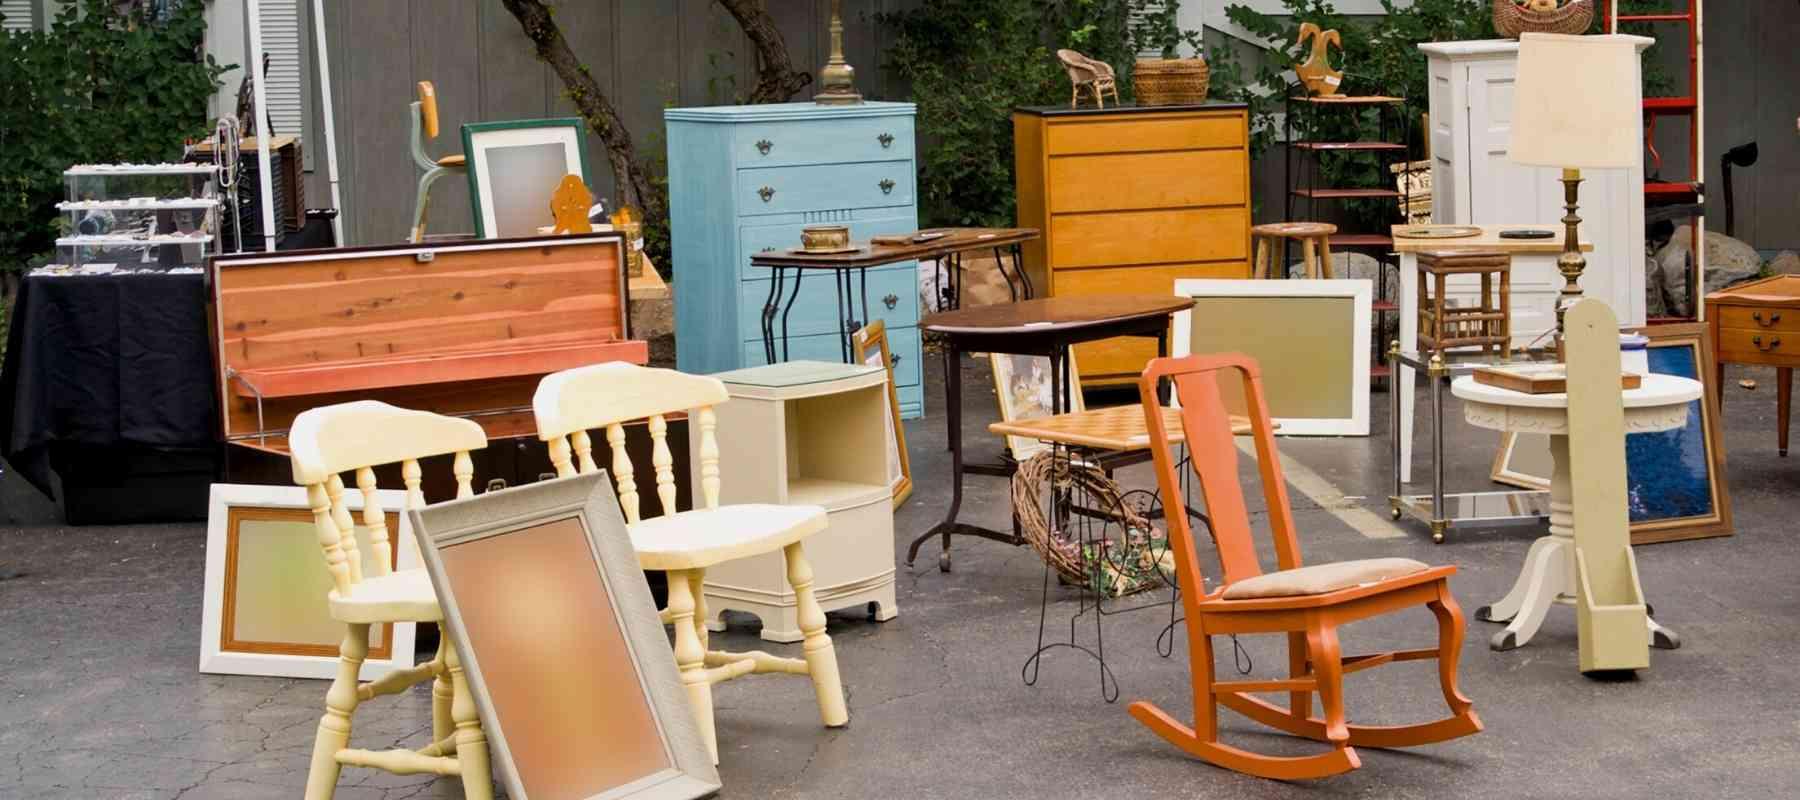 Flea Market Flipping Furniture